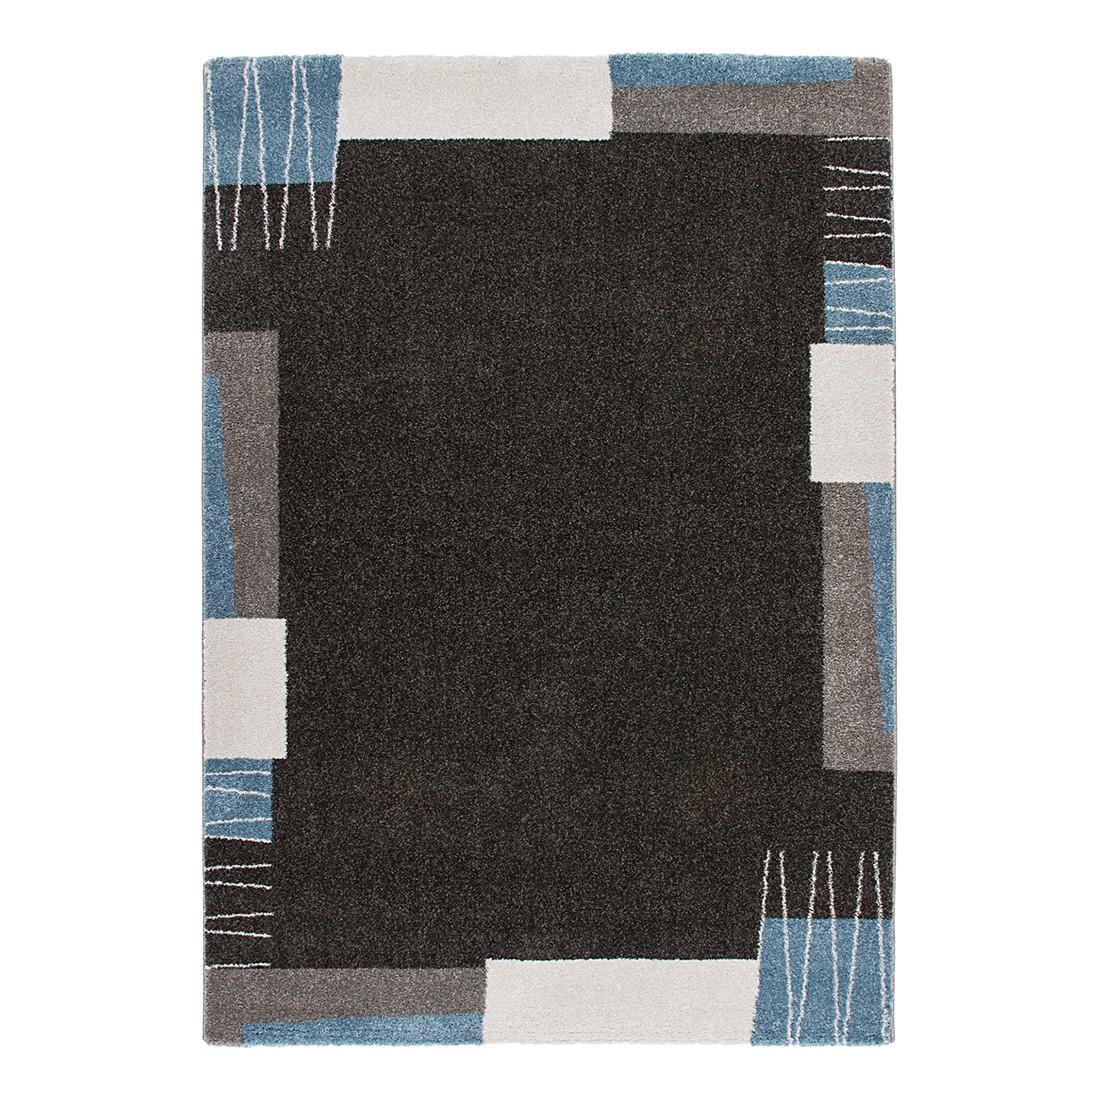 Teppich Kenya – Nairobi – Blau – 160 x 230 cm, Kayoom online bestellen